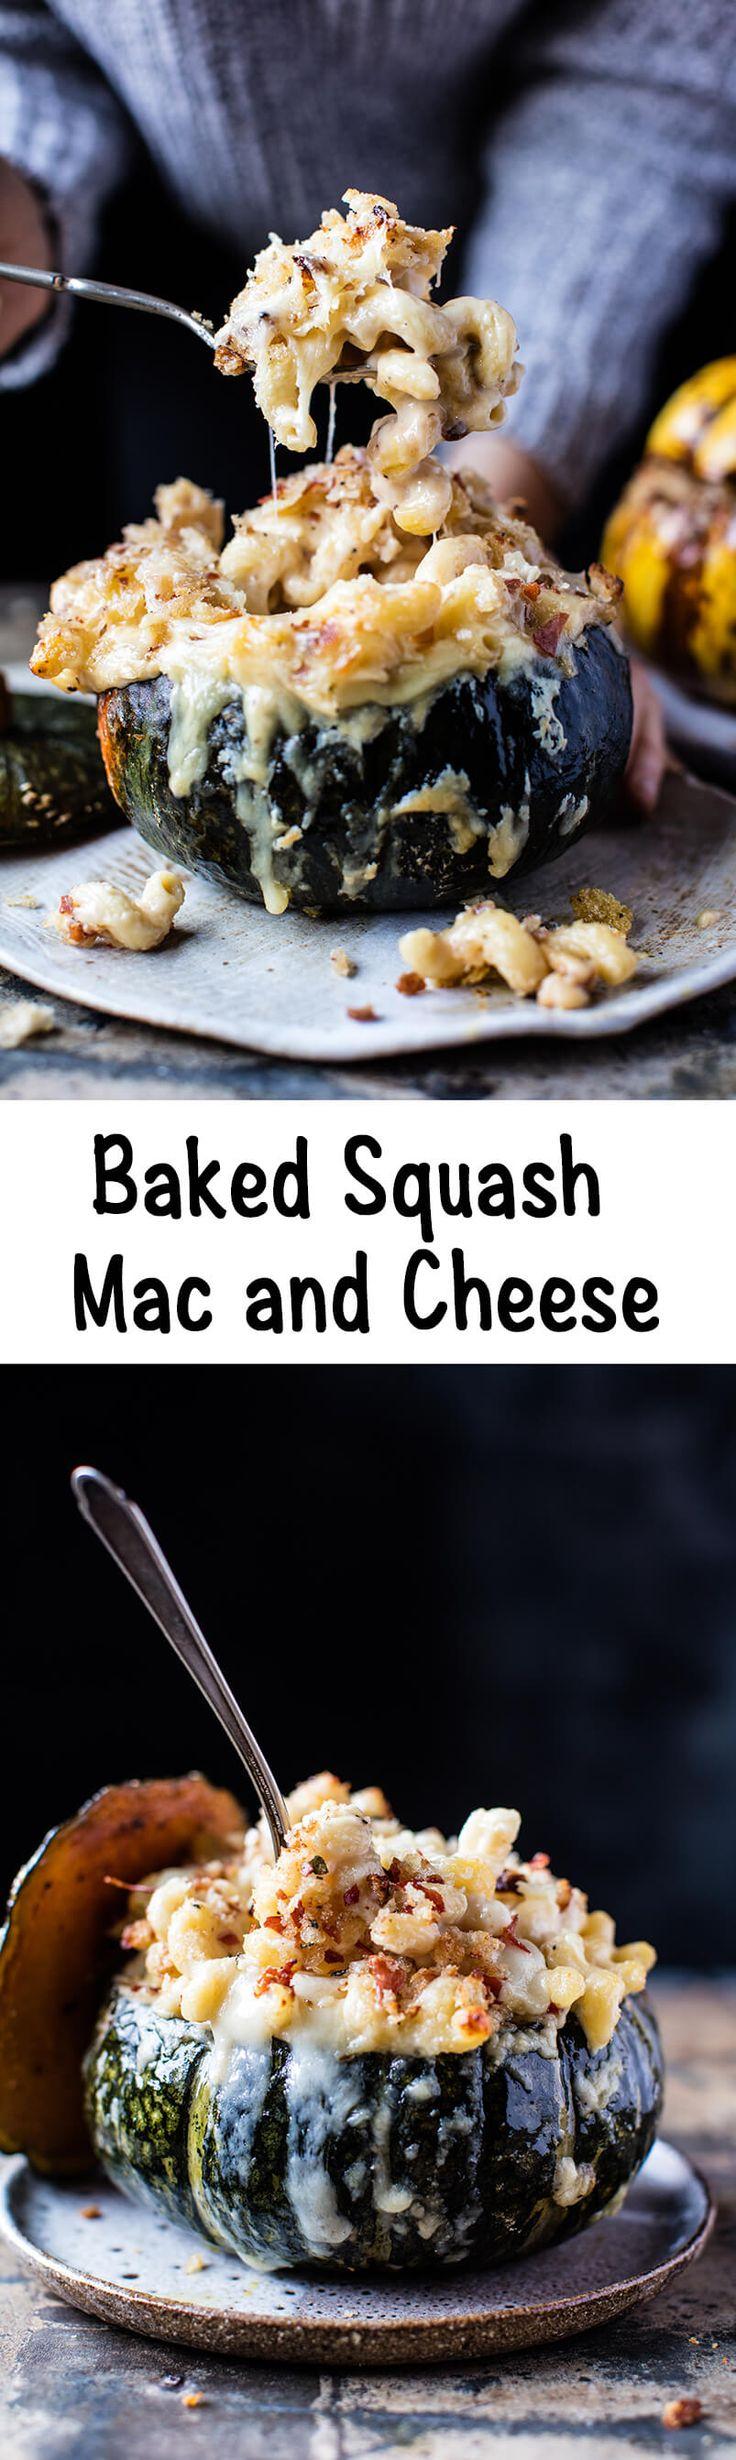 Baked Squash Mac and Cheese | halfbakedharvest.com @hbharvest